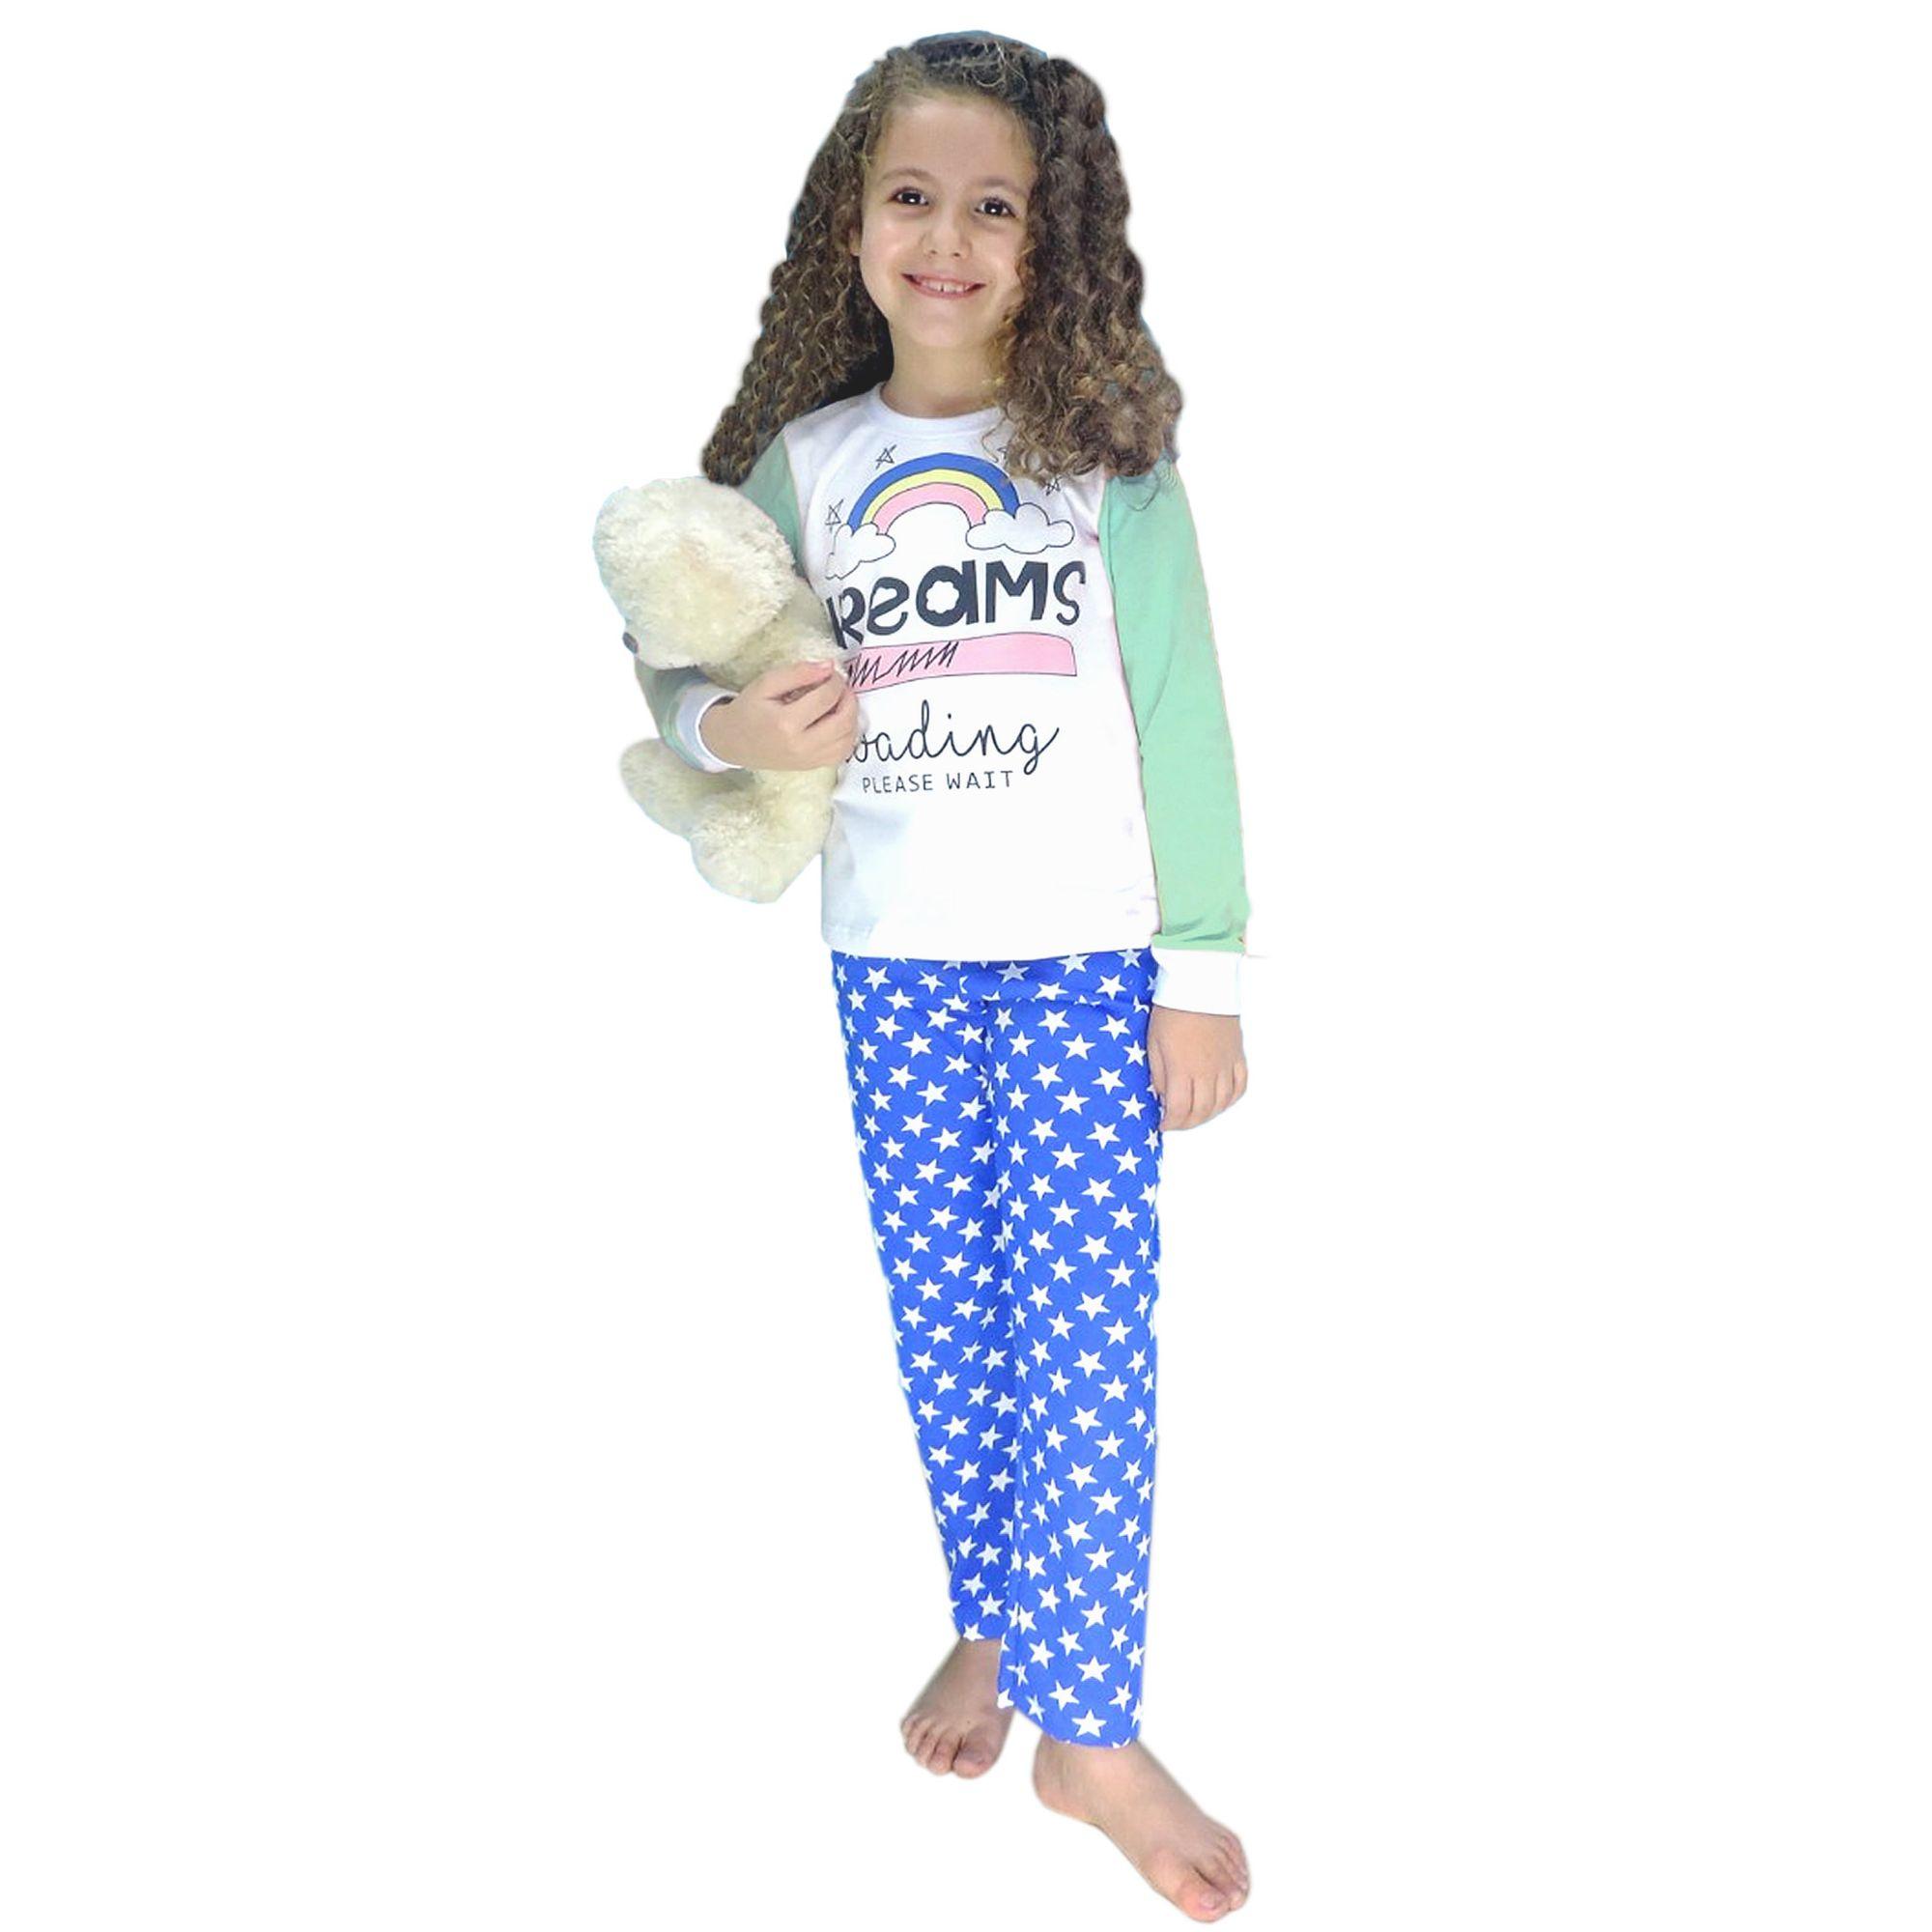 pijama-meninas-manga-longa-dreams-calca-azul-estrelas-1